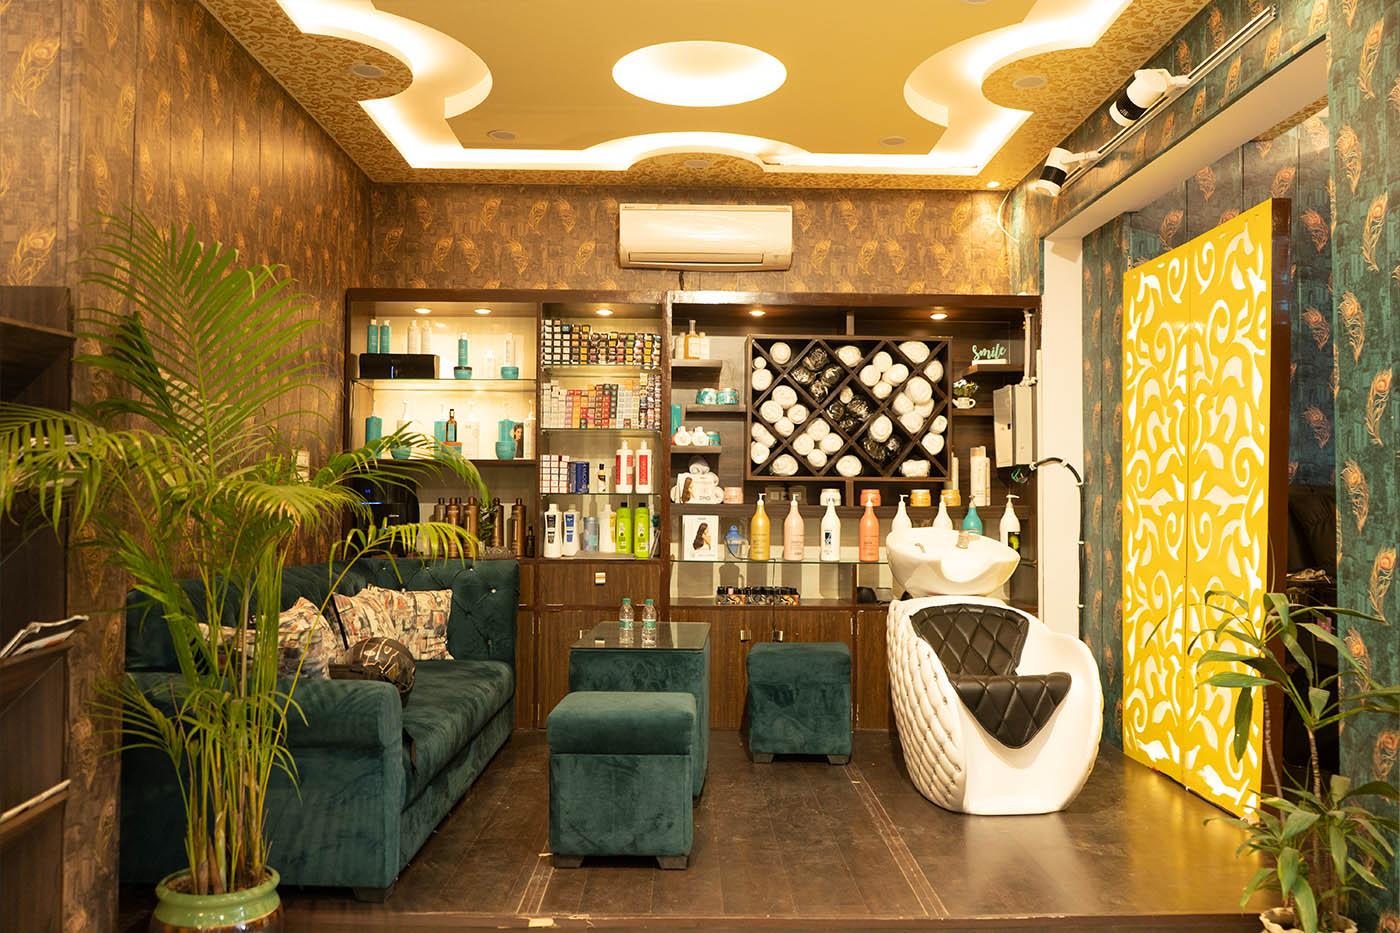 Ashrit Vatika Salon offers Tranquility and Quality